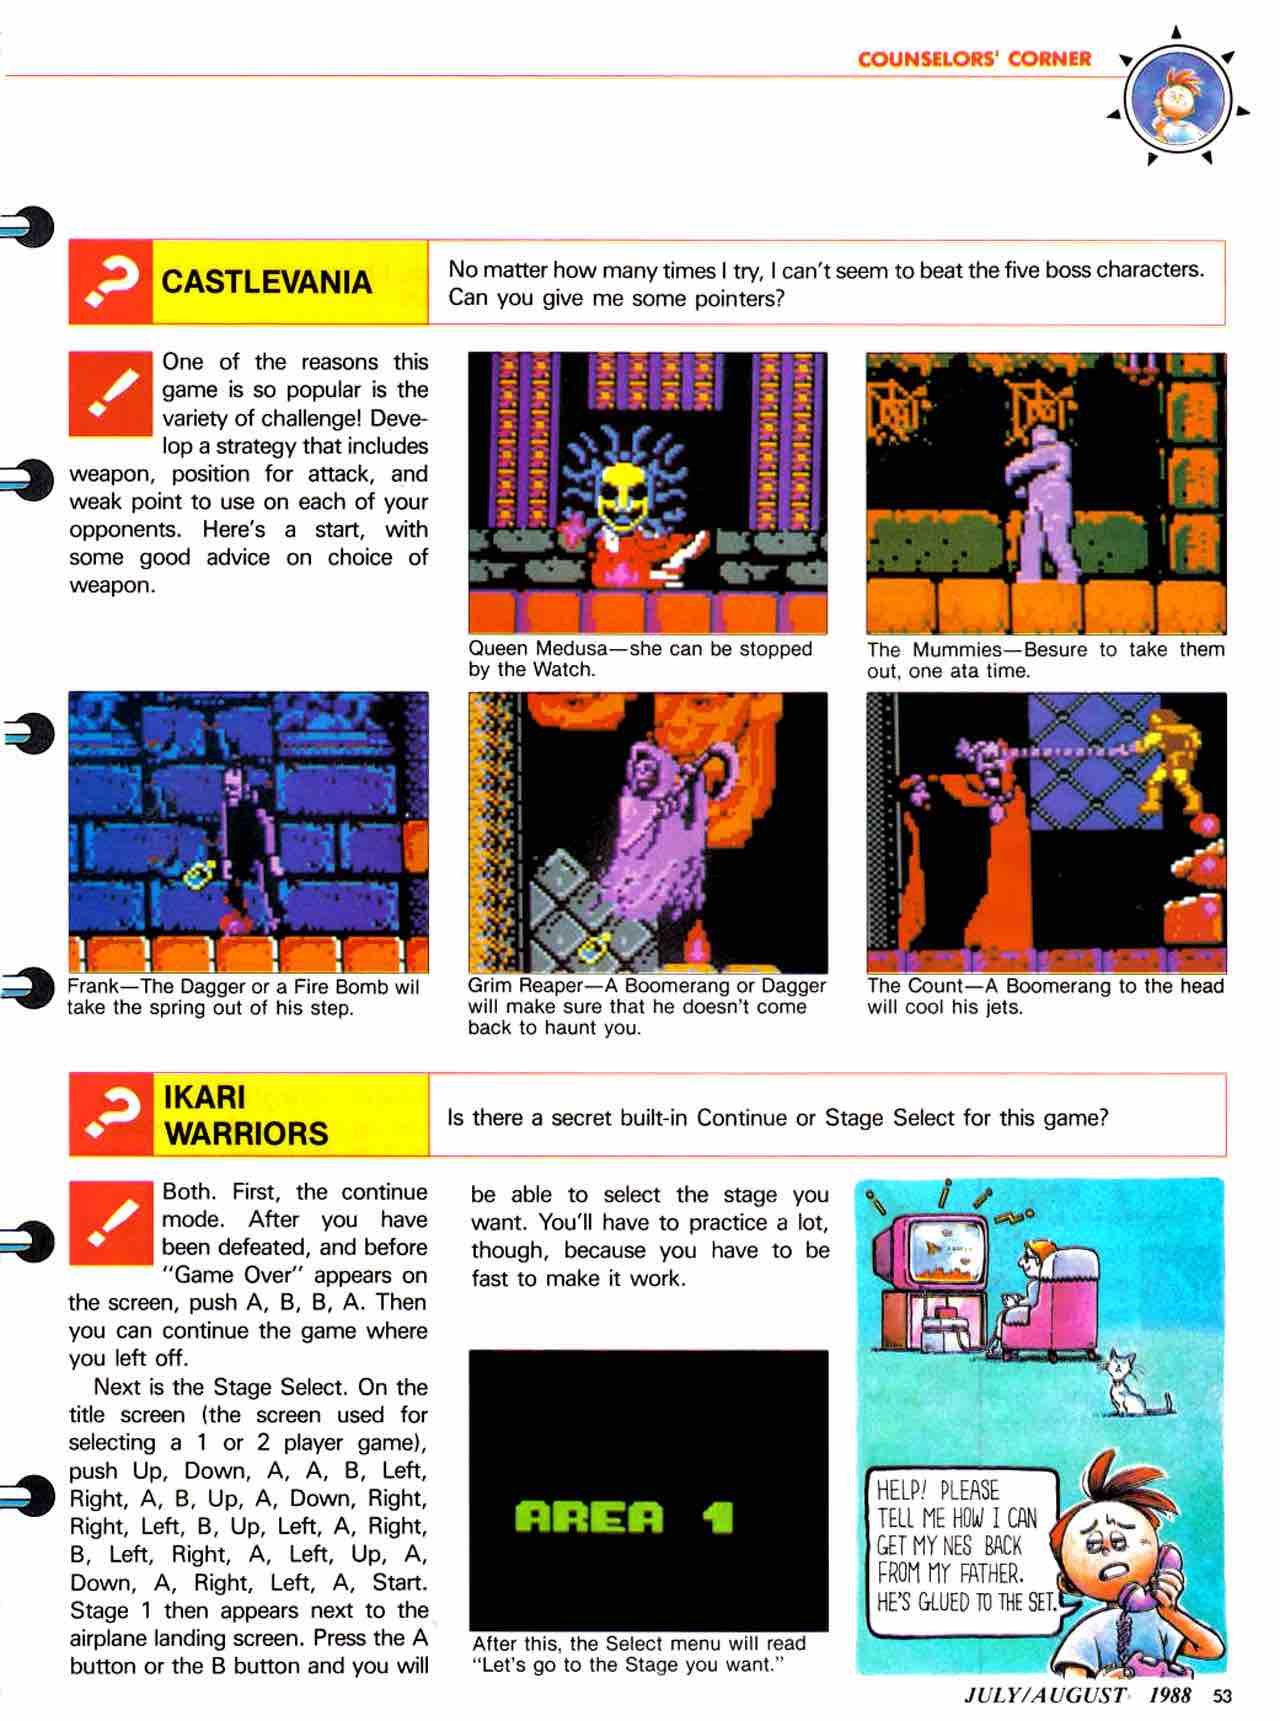 Nintendo Power   July August 1988 - pg 53